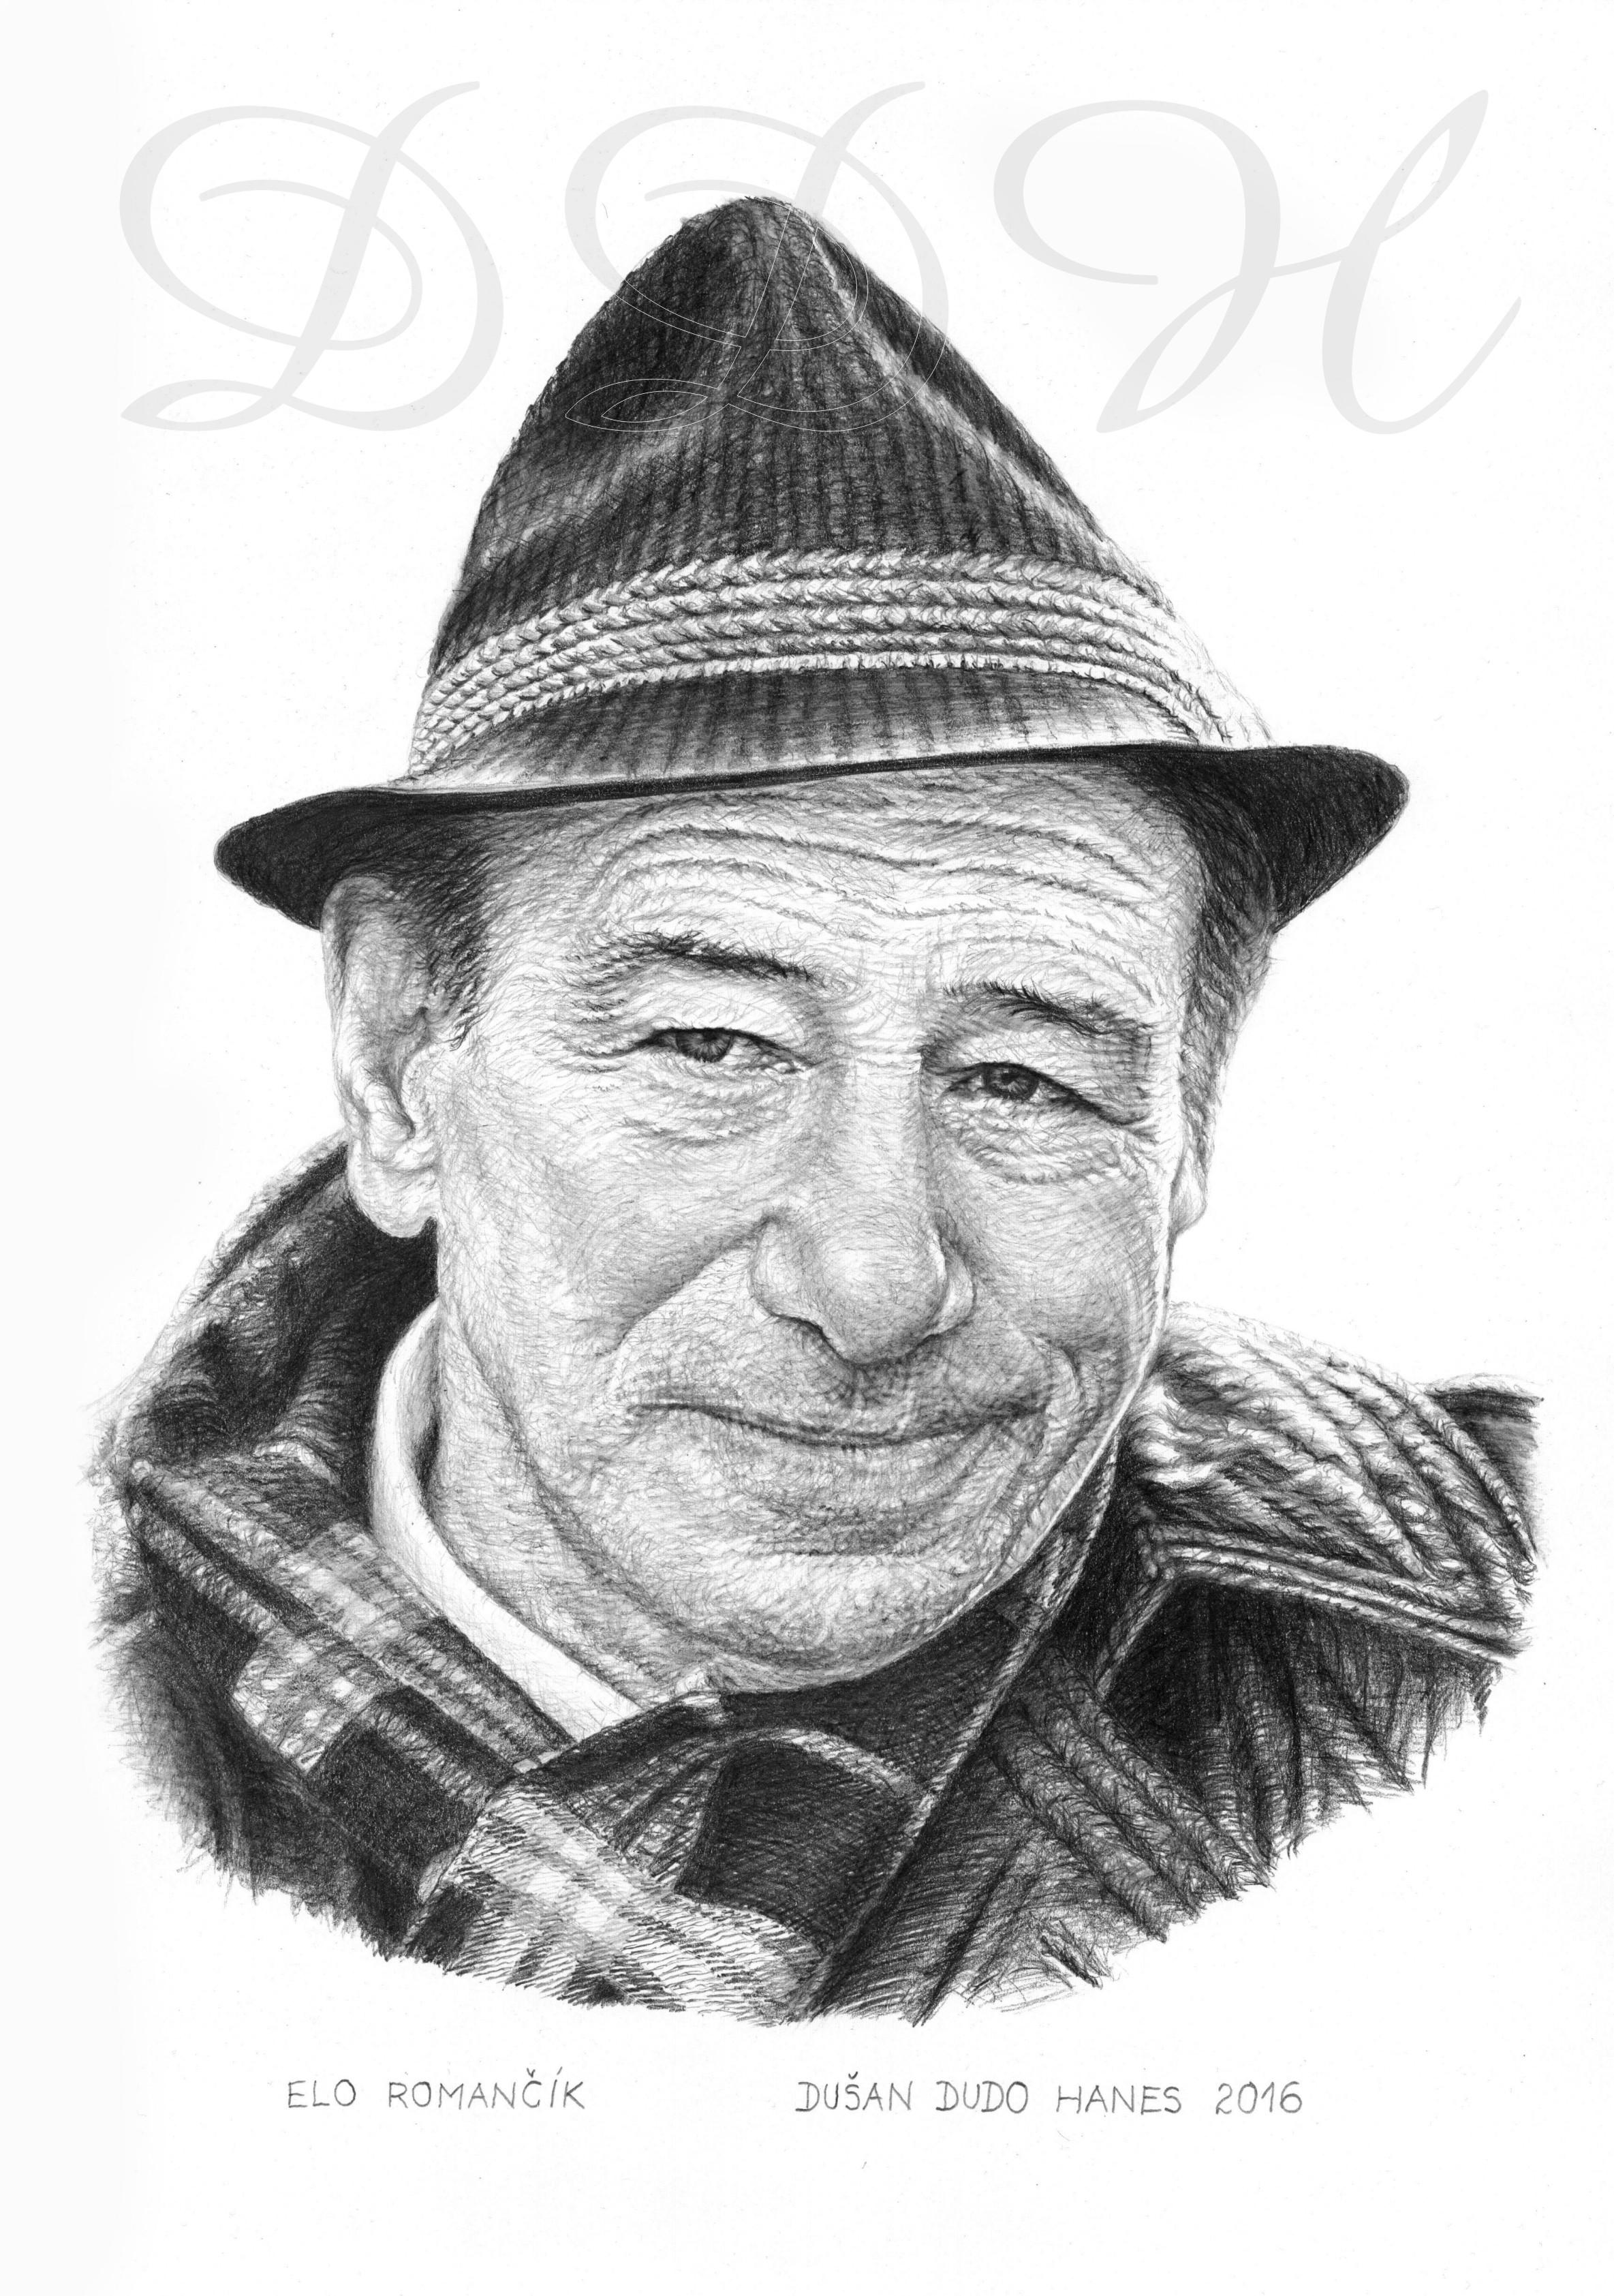 113 - Elo Romančík, portrét Dušan Dudo Hanes